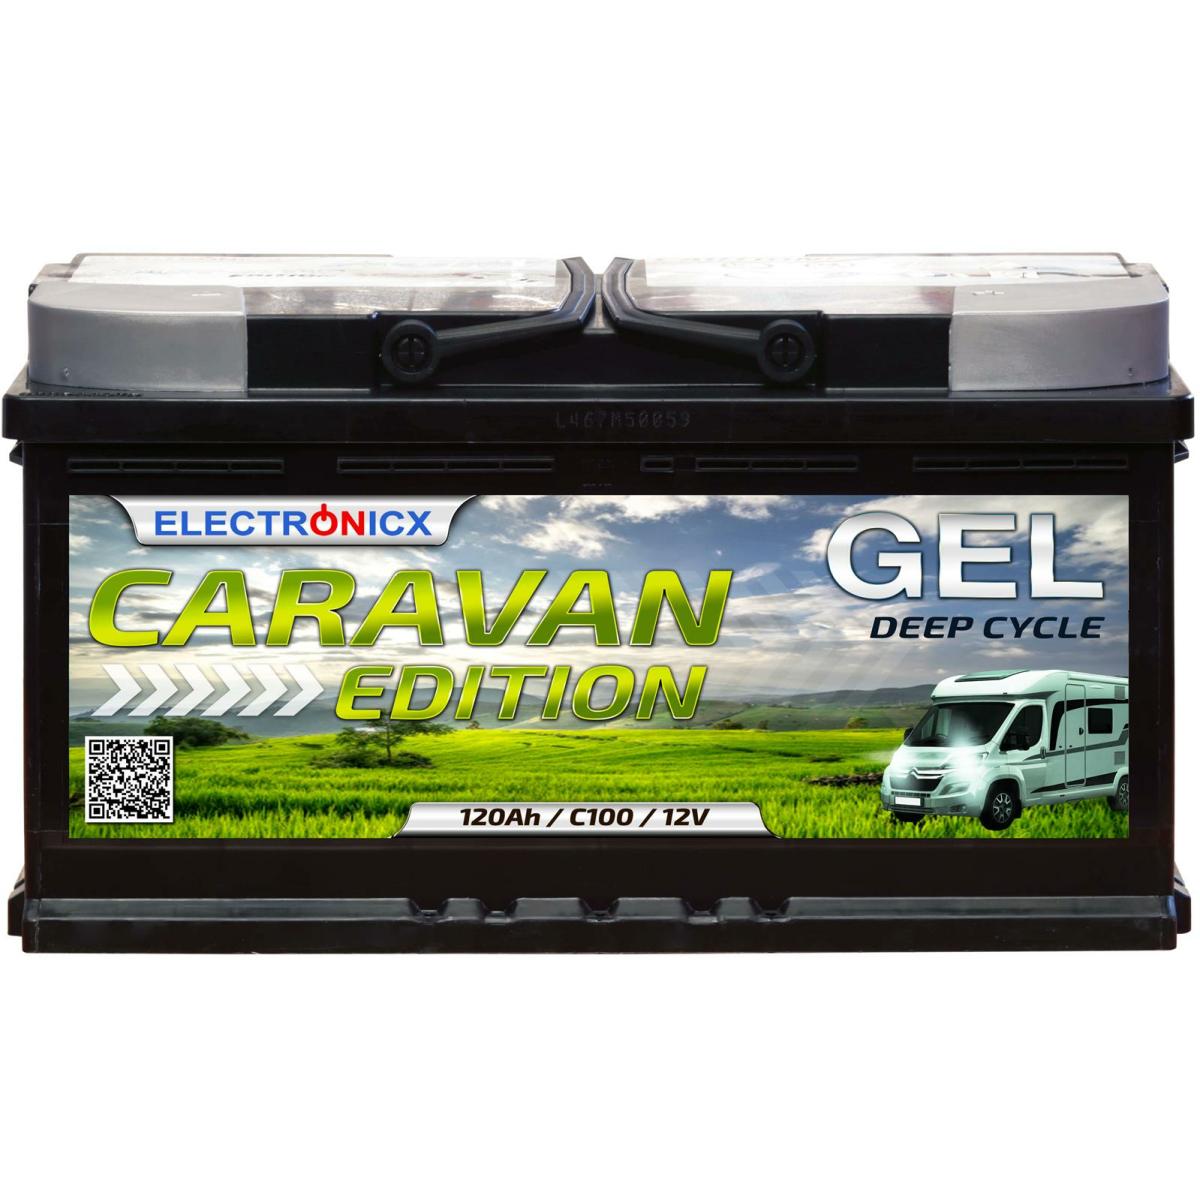 Electronicx Caravan Edition Gel Batterie 120 AH 12V Wohnmobil Boot Versorgung